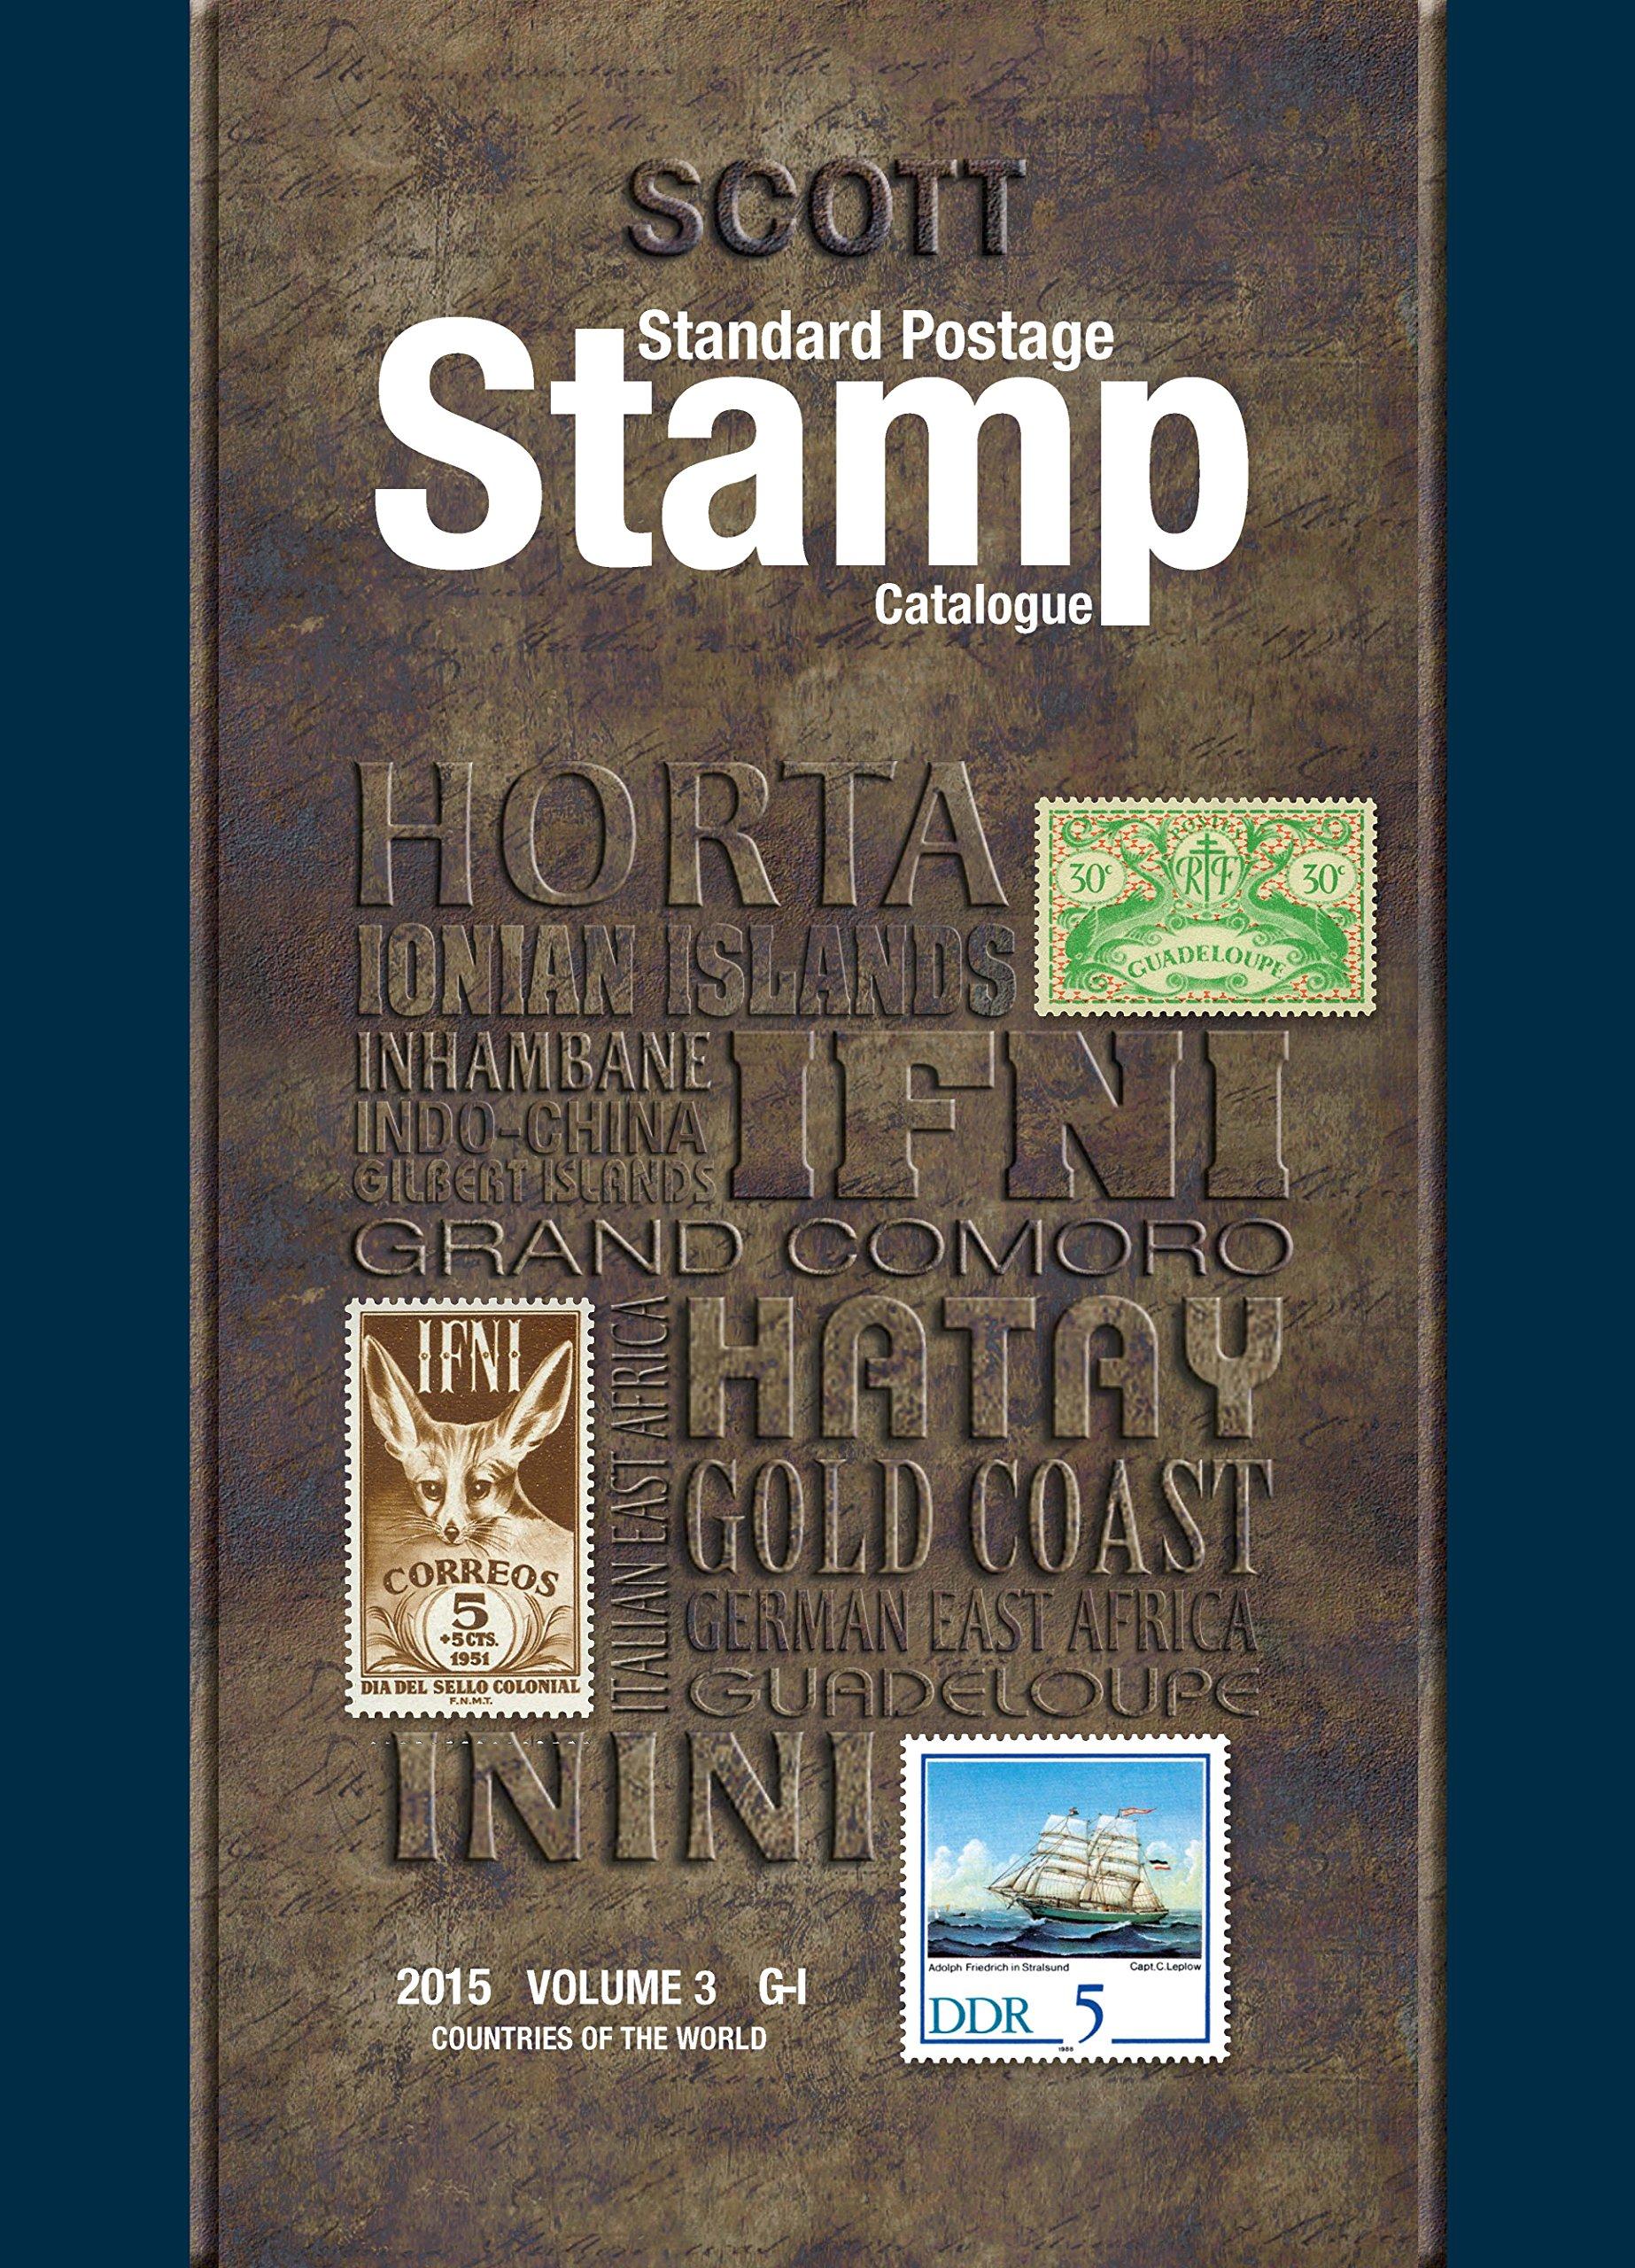 Scott Standard Postage Stamp Catalogue, Volume 3: Countries of the World: G-I (Scott Standard Postage Stamp Catalogue: Vol.3: Countries of the World G-I)